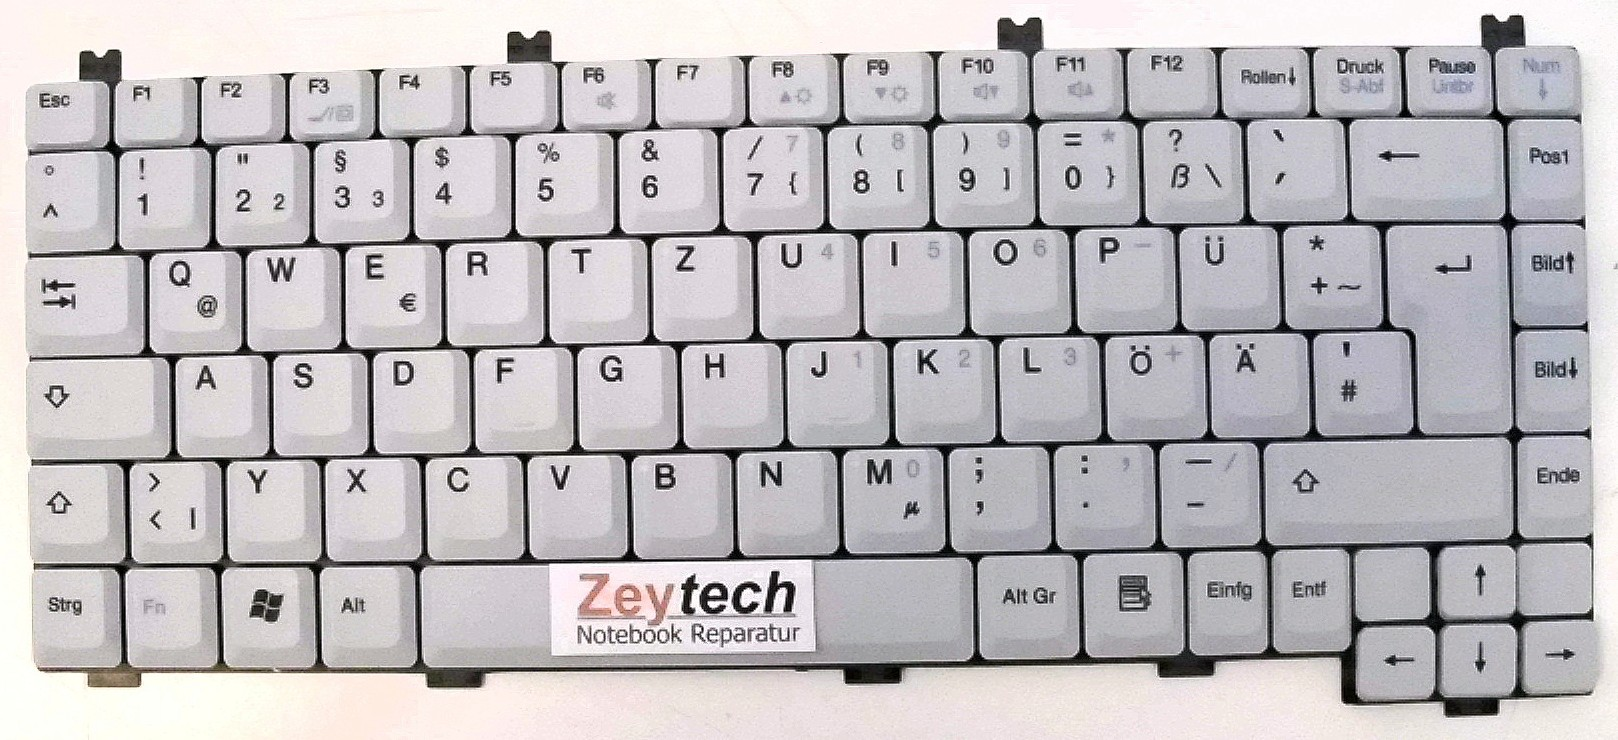 original fsc amilo l7300 tastatur deutsch k011405h1 neu ebay. Black Bedroom Furniture Sets. Home Design Ideas